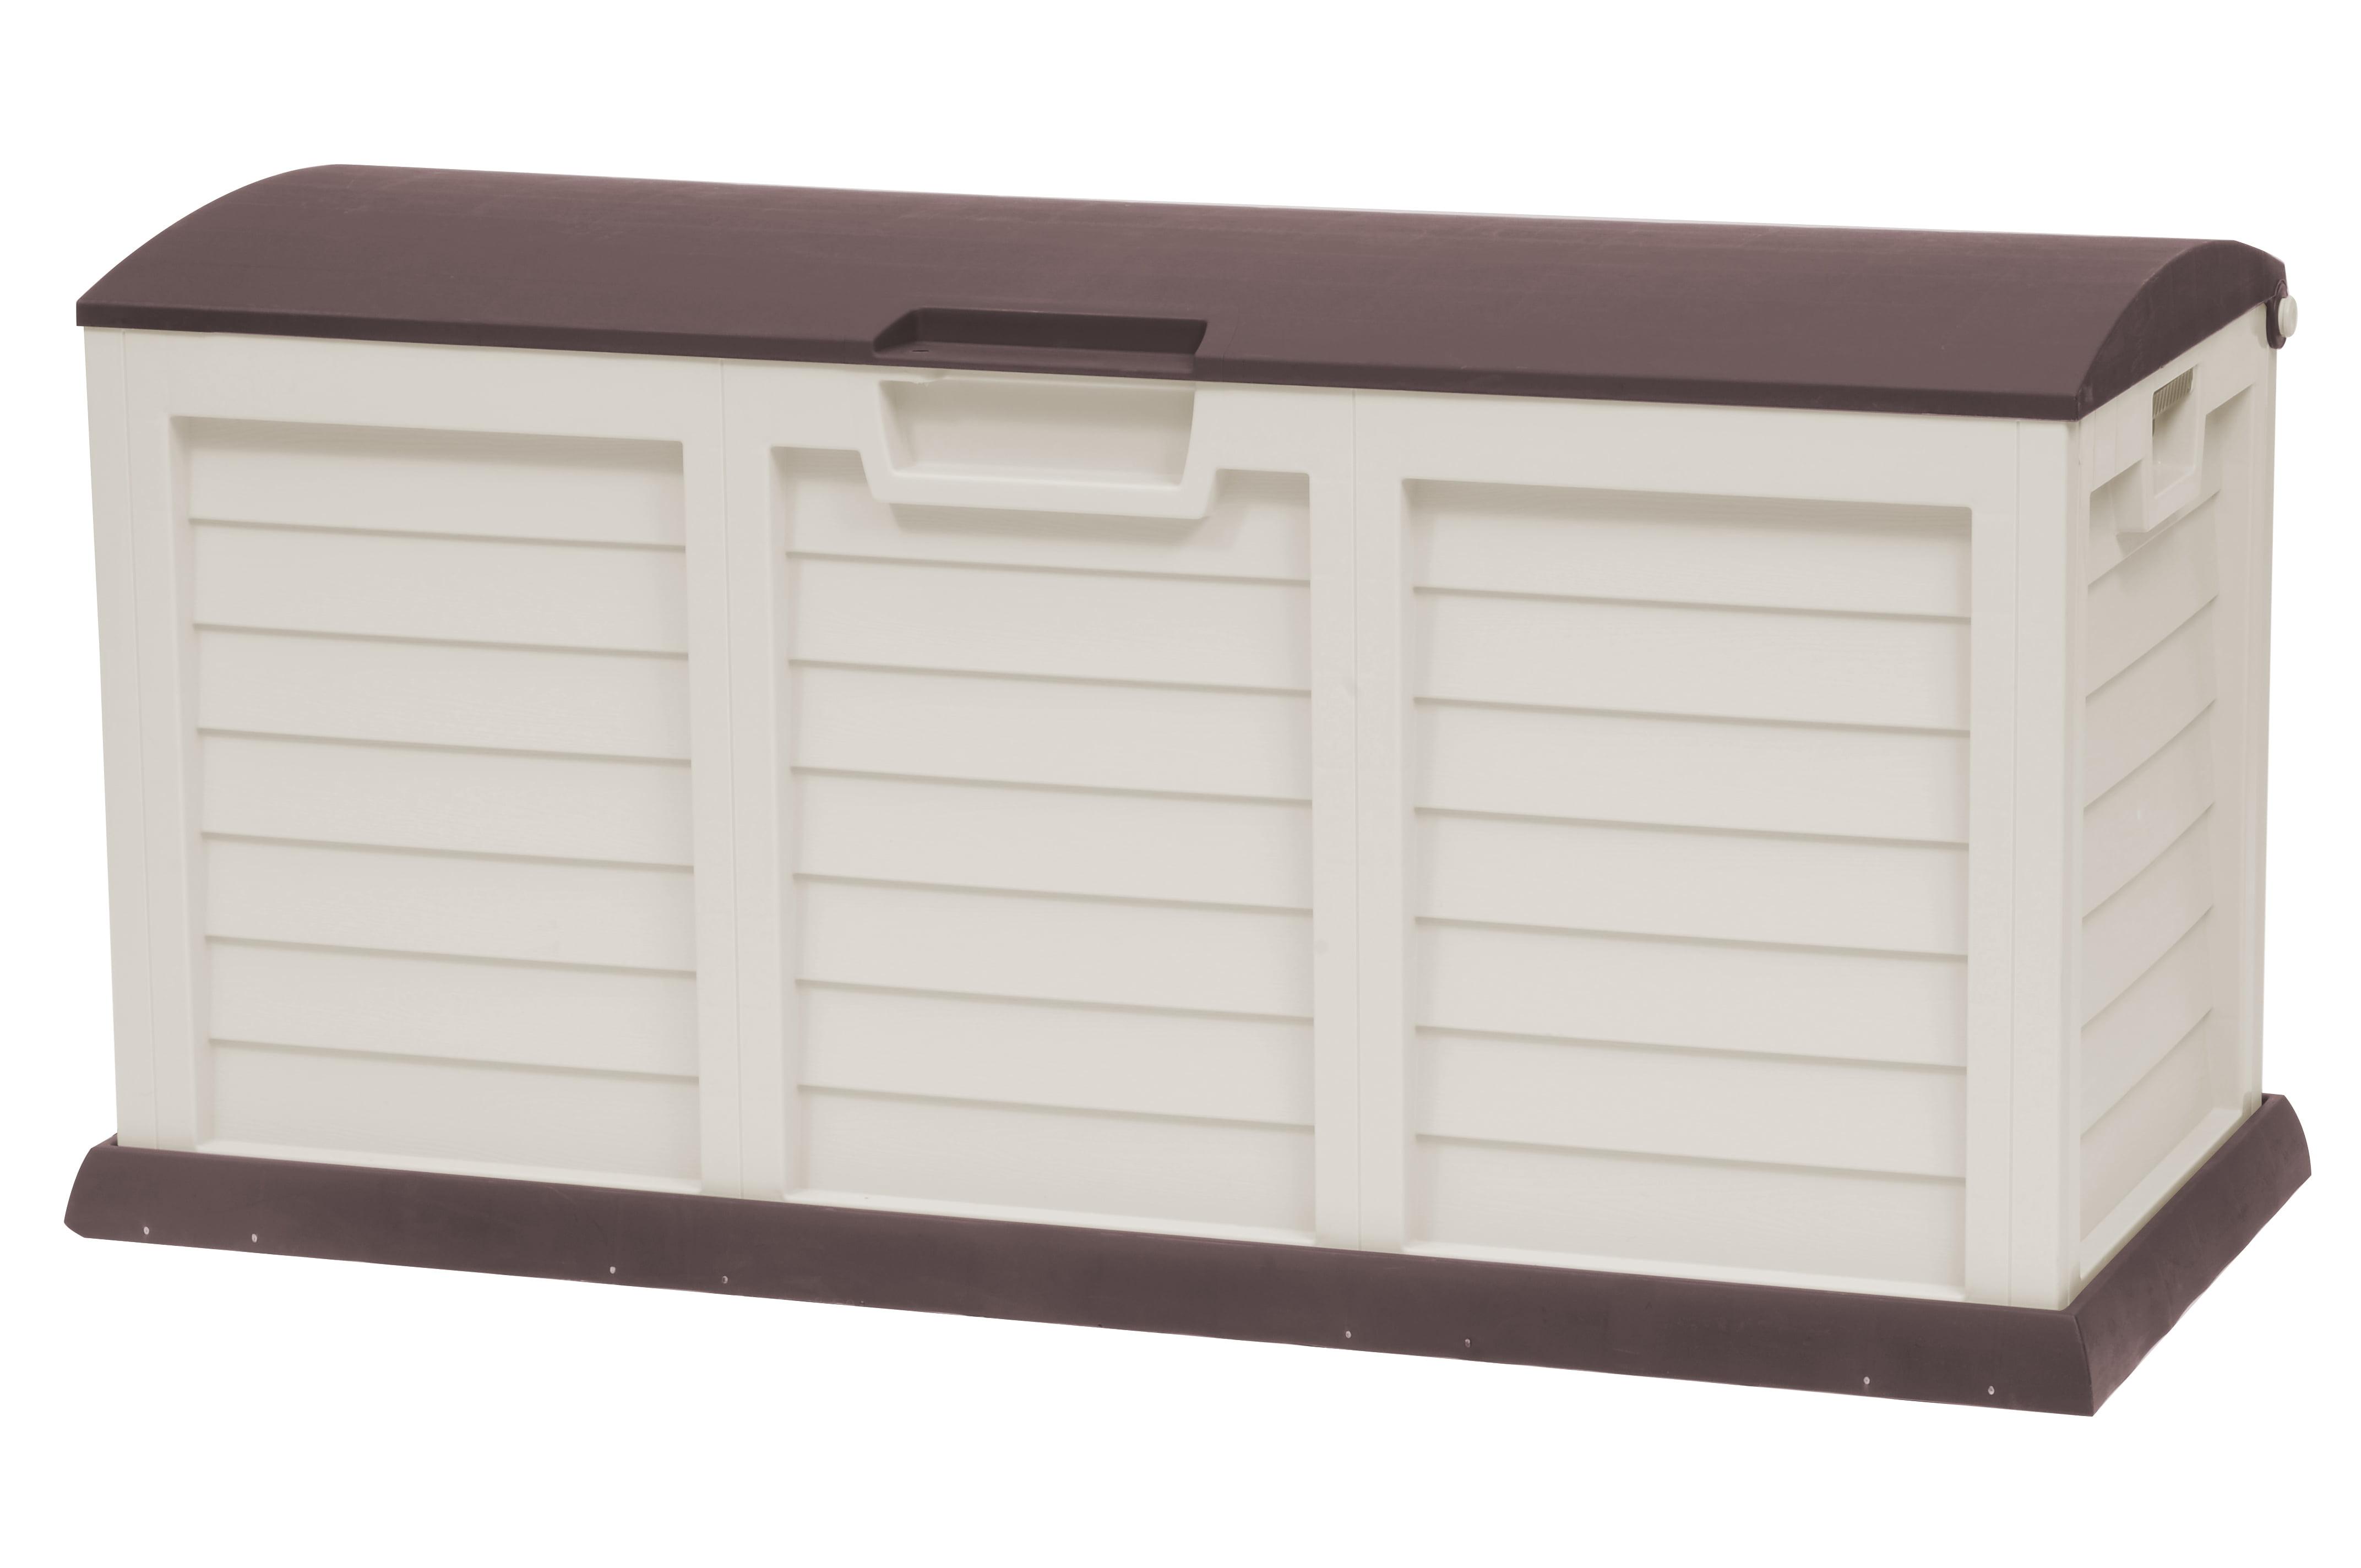 103 Gallon Deck Box With Dome Lid, Light Mocha Brown by Starplast